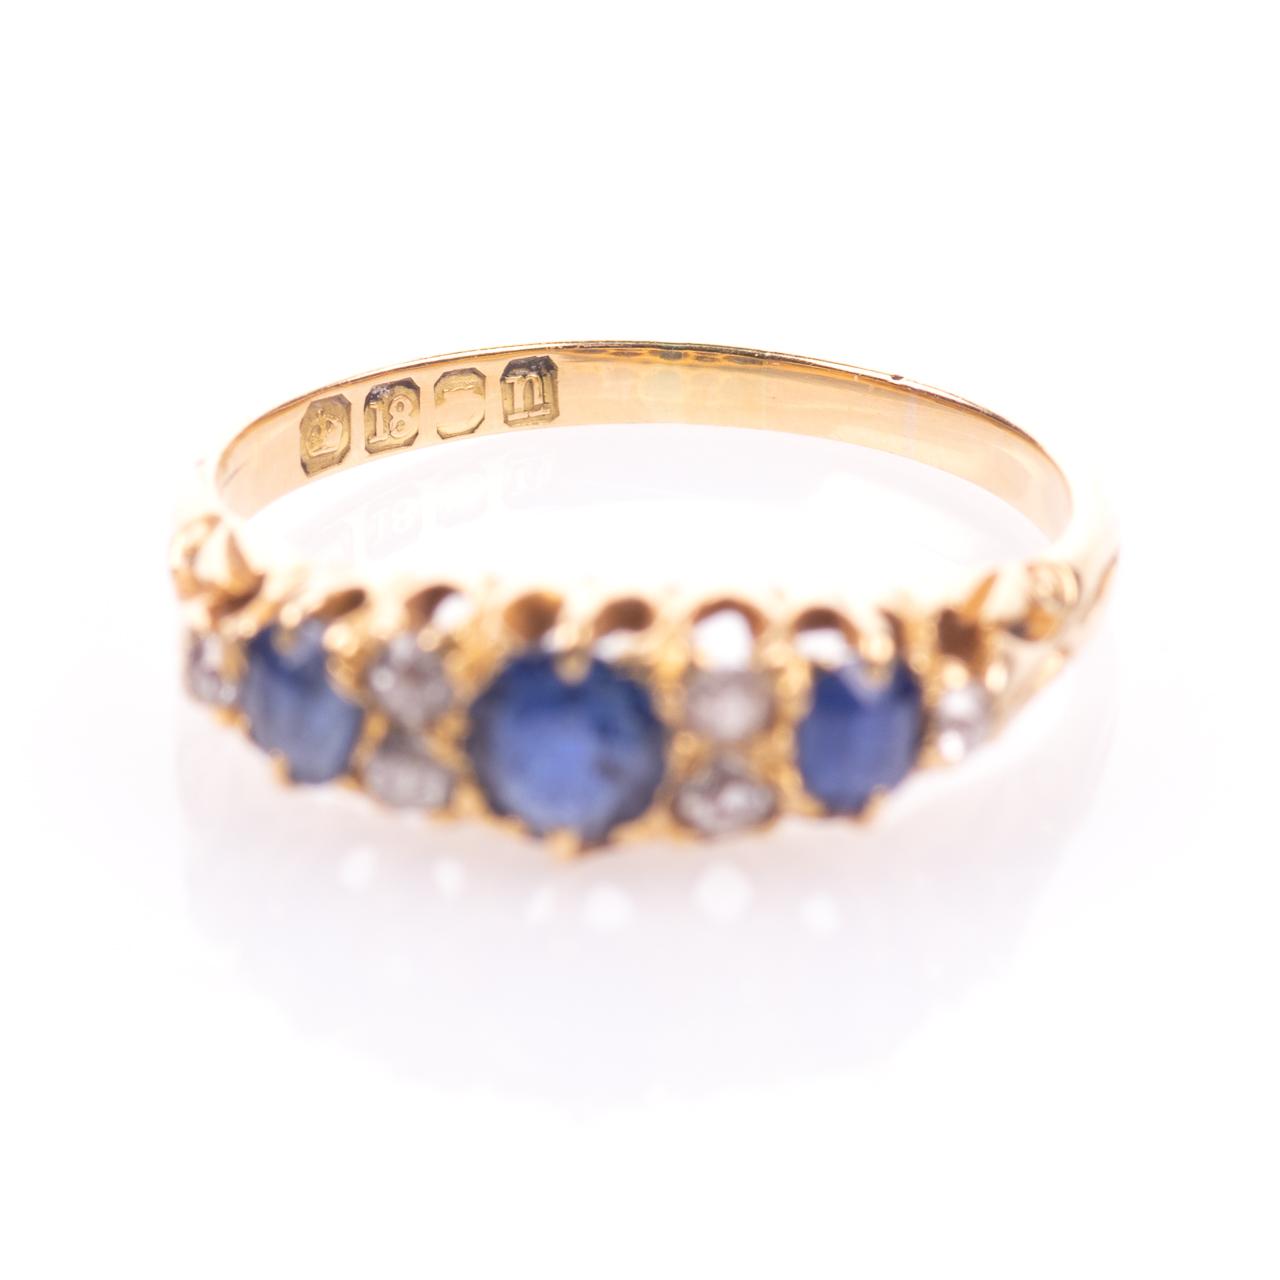 18ct Gold George V 1ct Sapphire & Diamond Ring London 1908 - Image 4 of 7